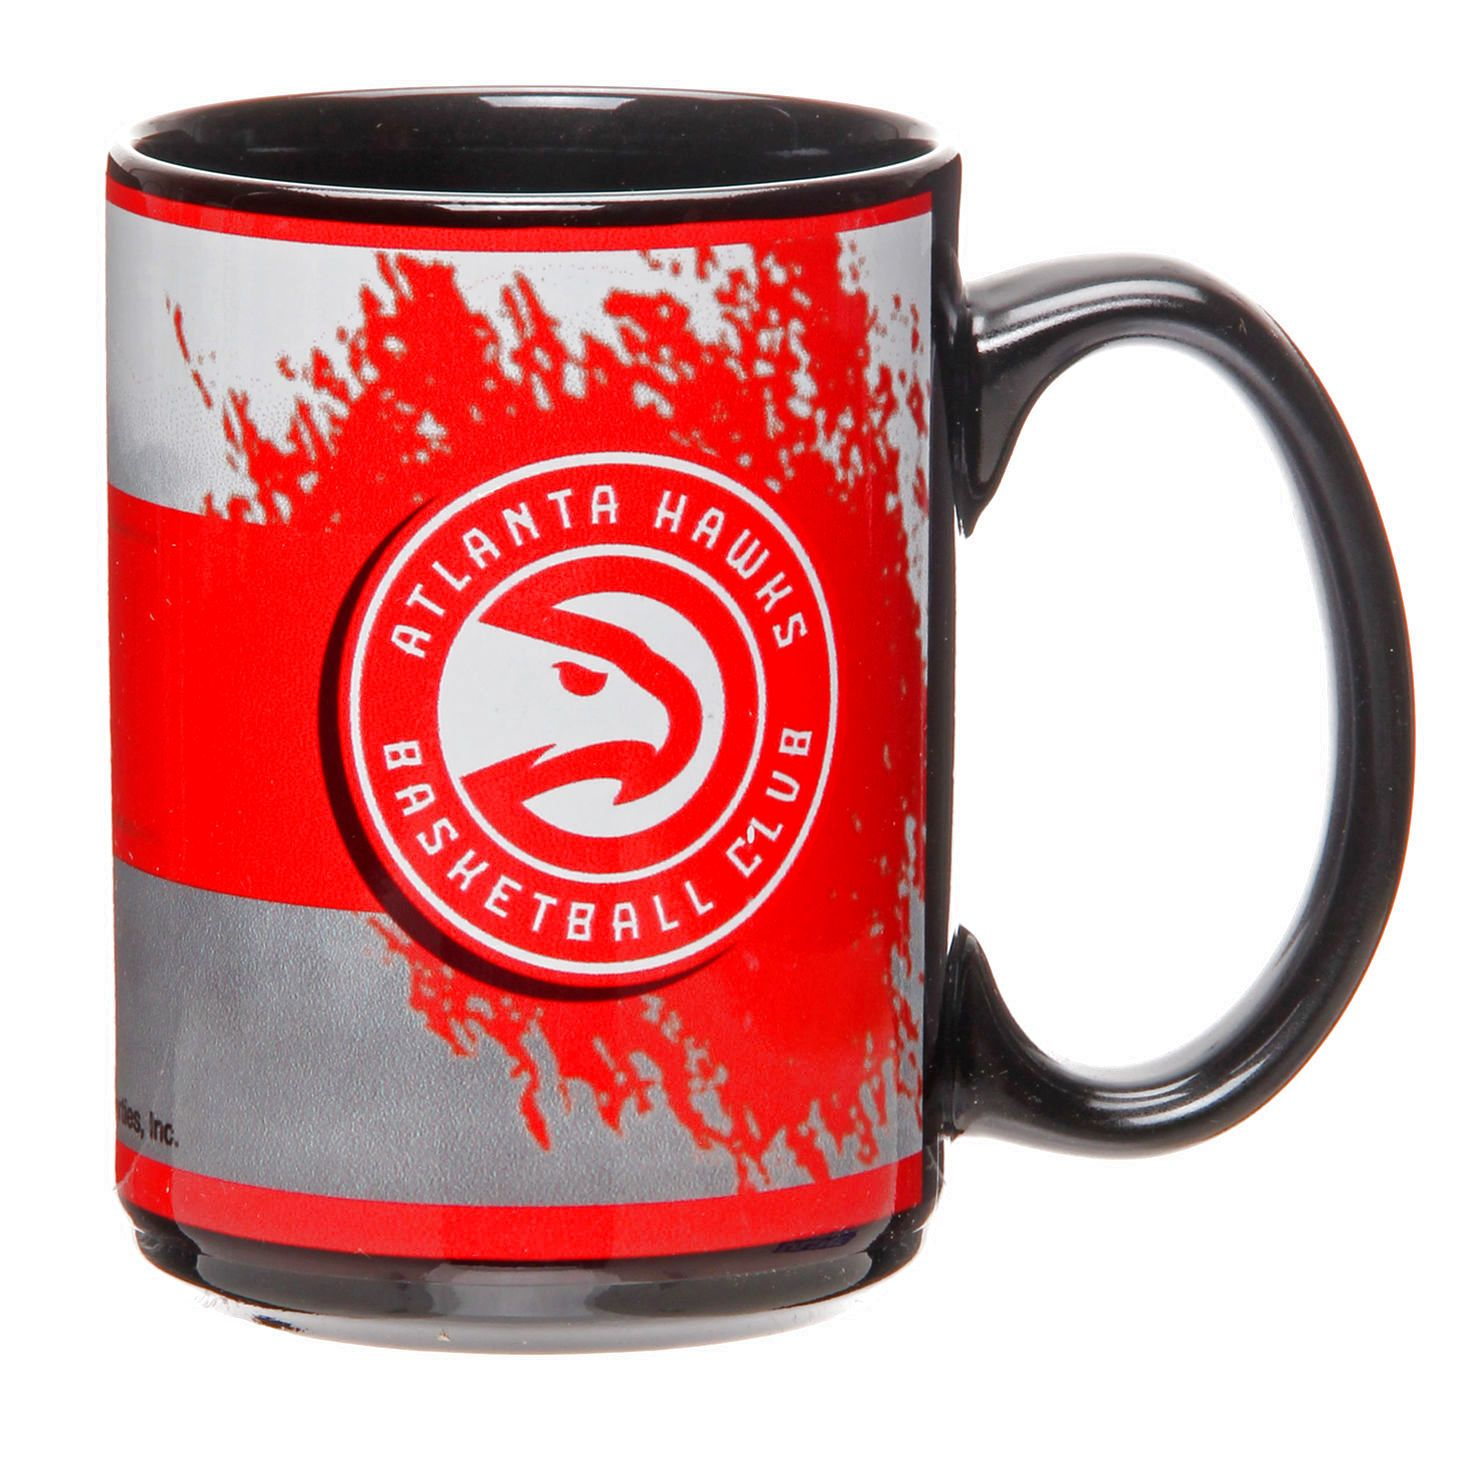 Atlanta Hawks 15oz. Mom Mug - $10.39